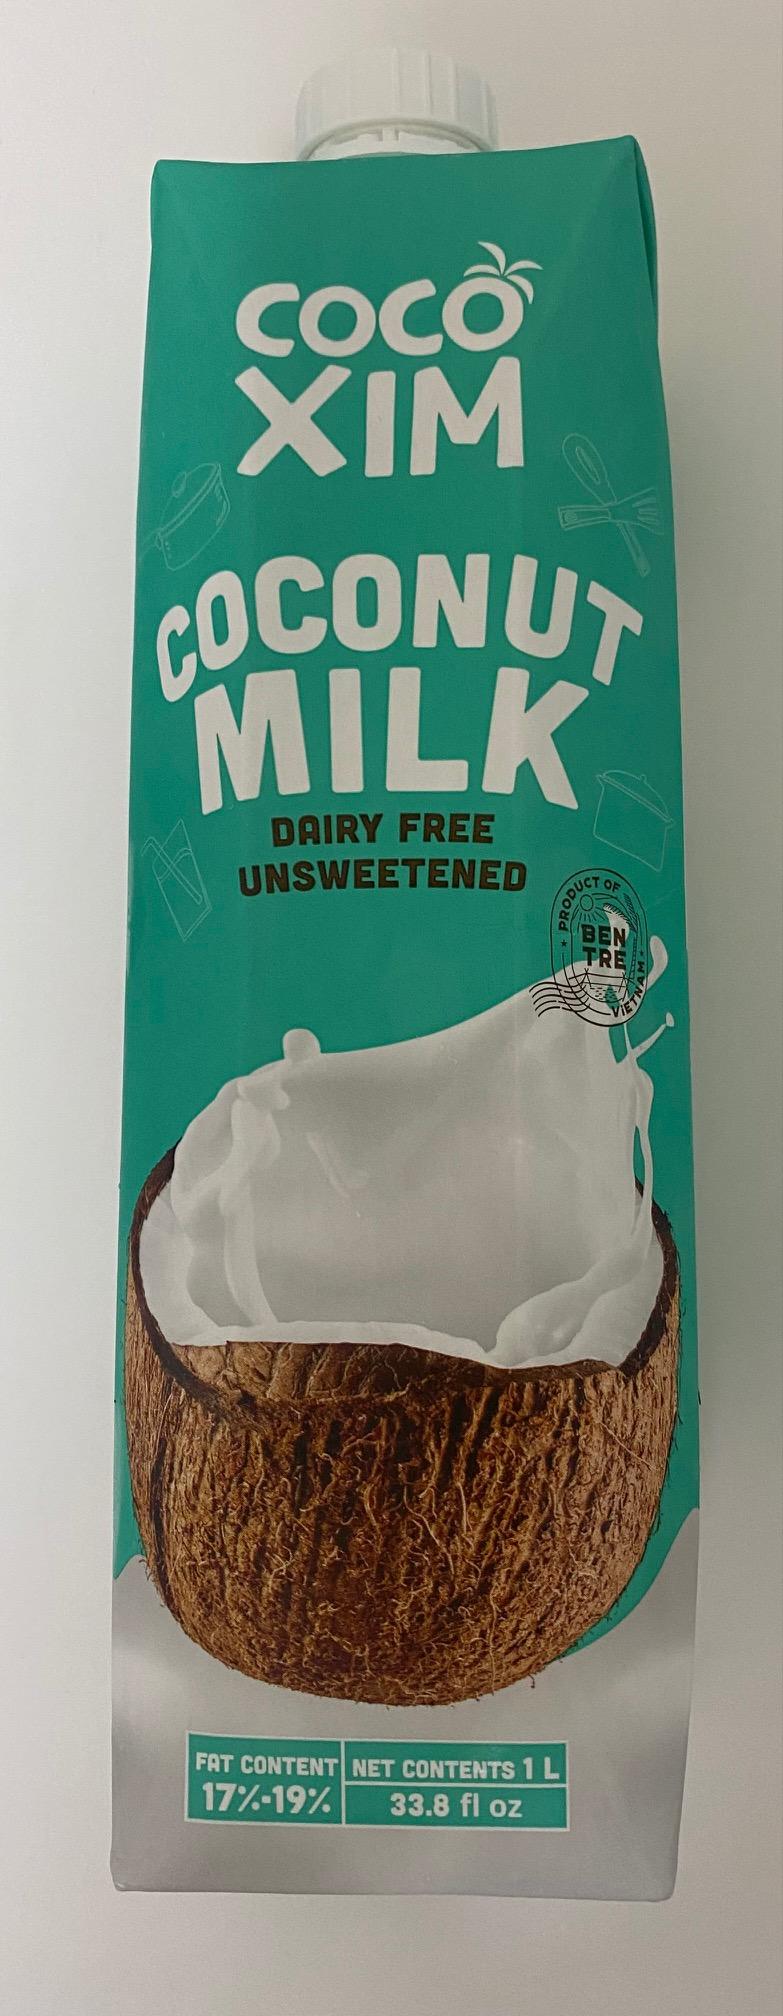 Coco Xim Coconut Milk